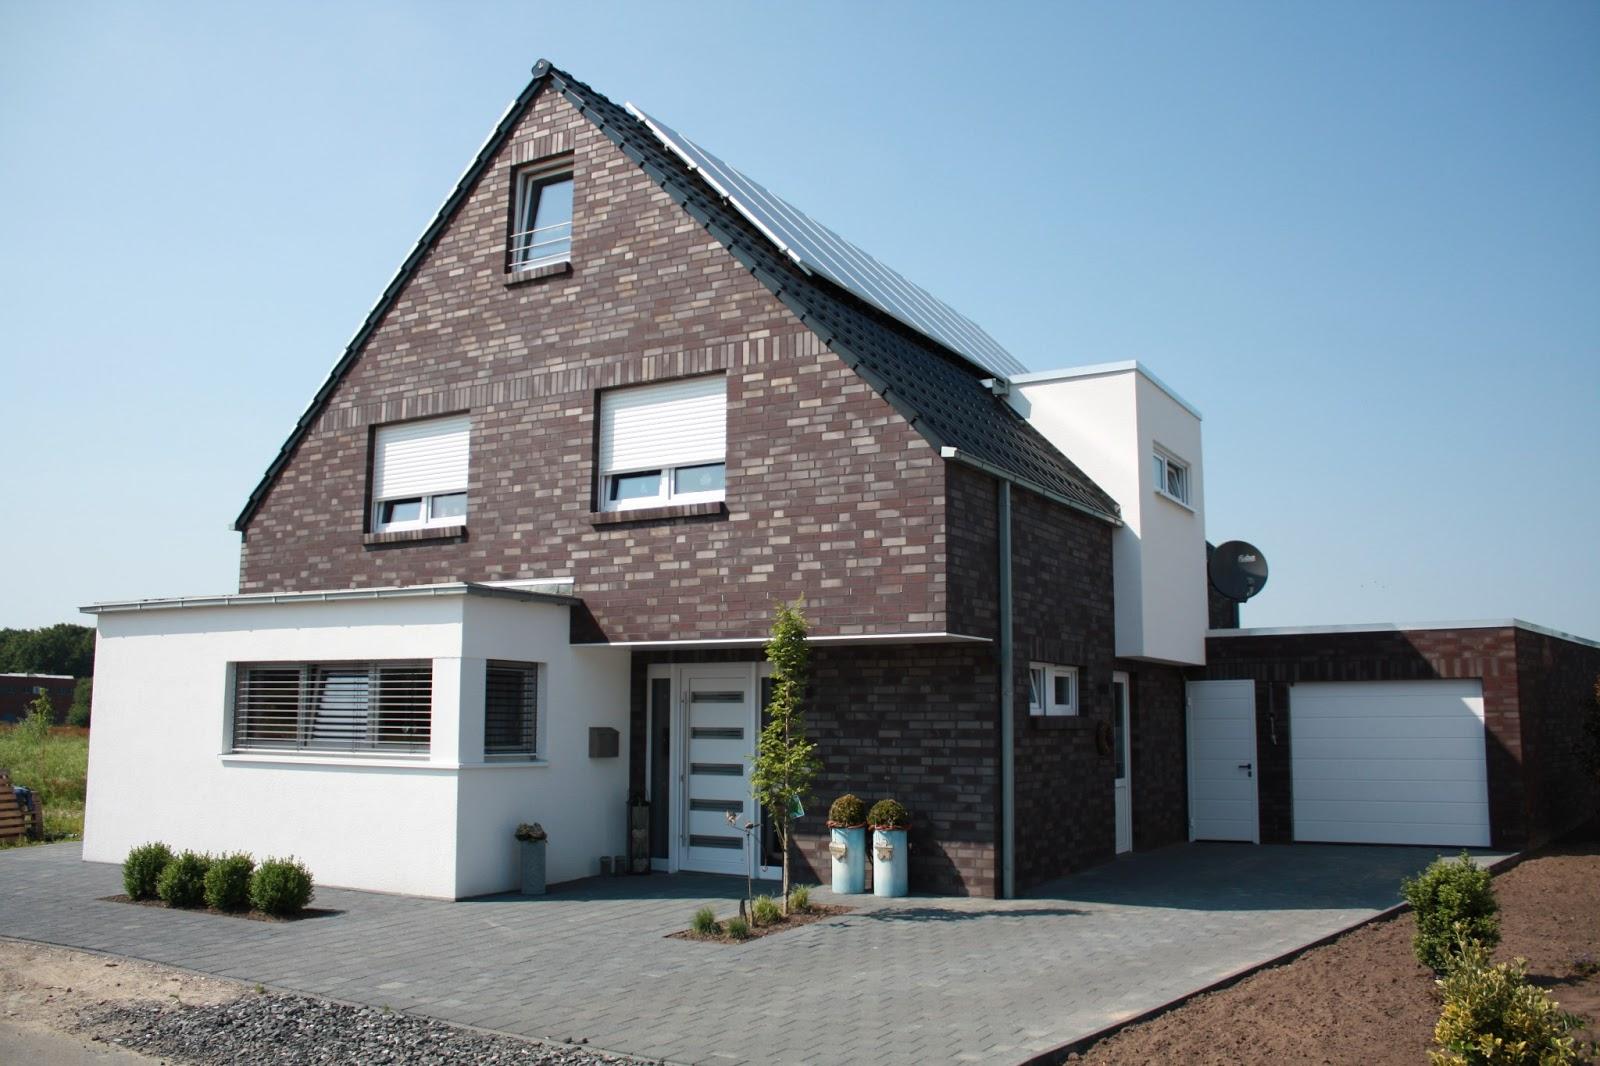 klinker fertighaus perfect als fertighaus with klinker fertighaus free klinker fertighaus with. Black Bedroom Furniture Sets. Home Design Ideas